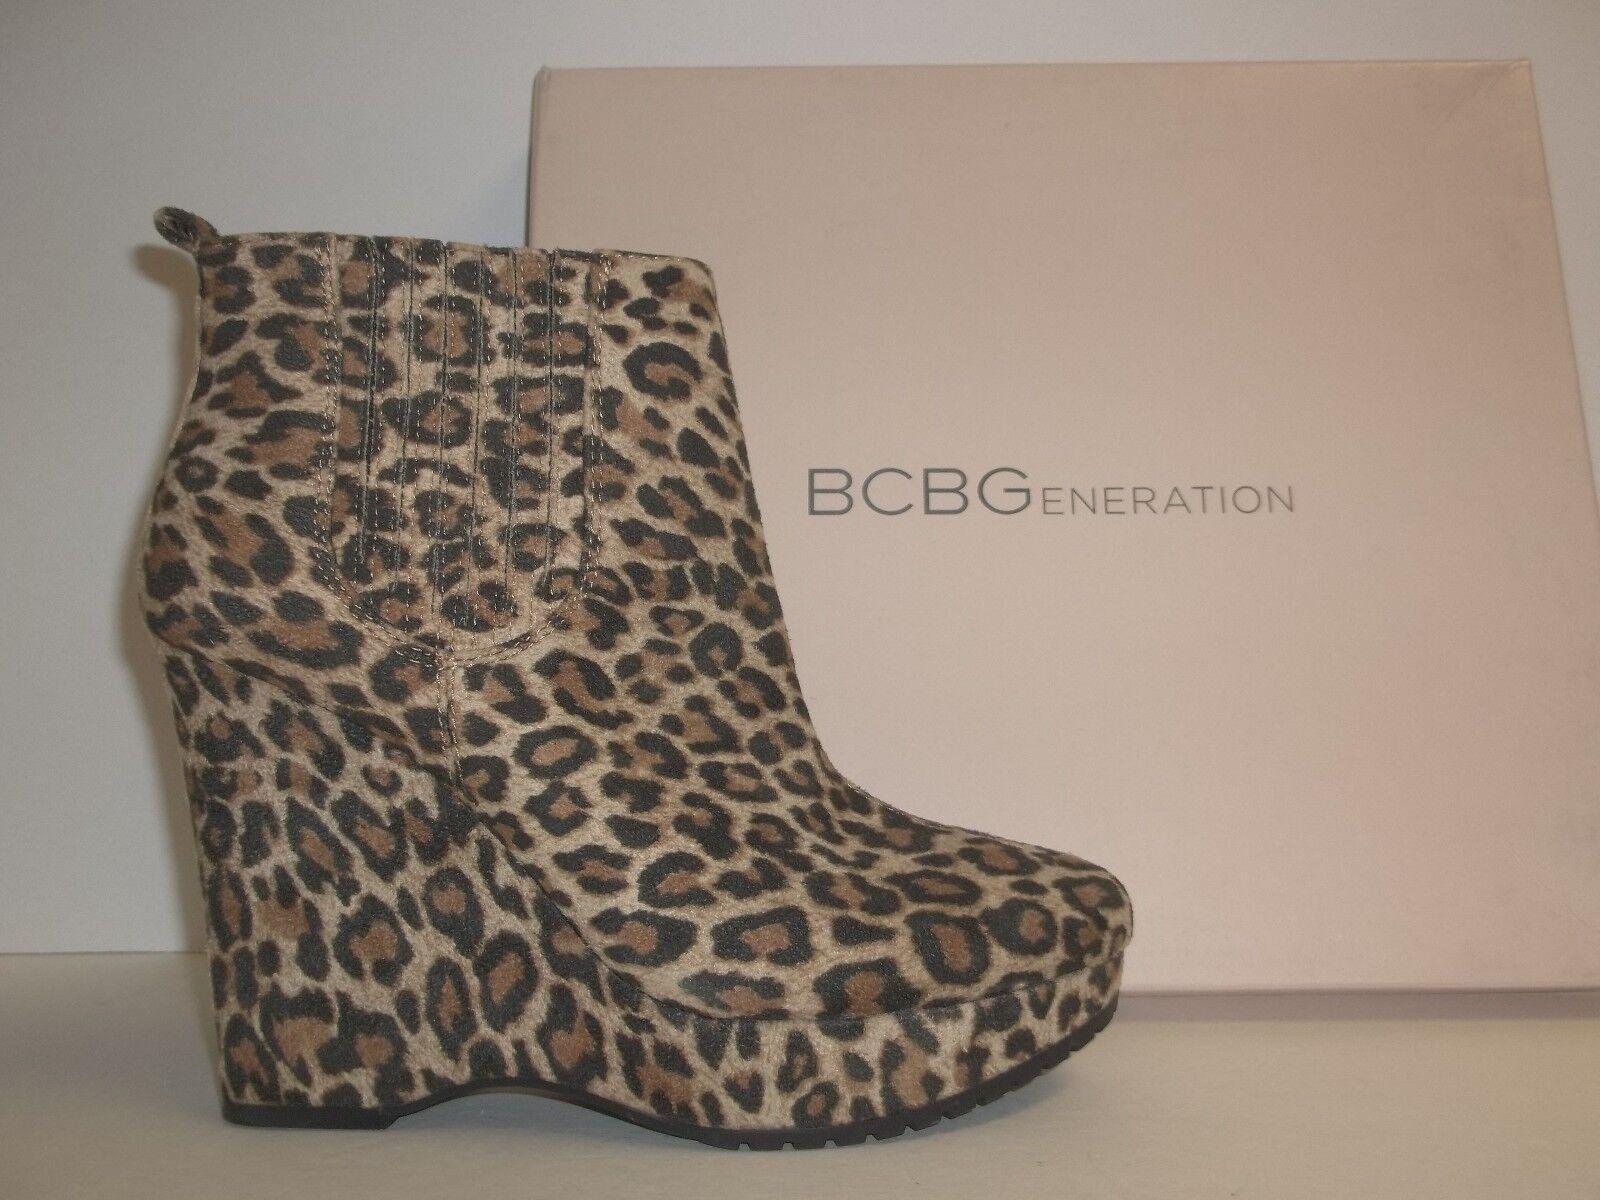 BCBGeneration BCBG Sze 5.5 M Vance 2 Vance2 Leopard Ankle Stiefel NEU Damenschuhe Schuhes